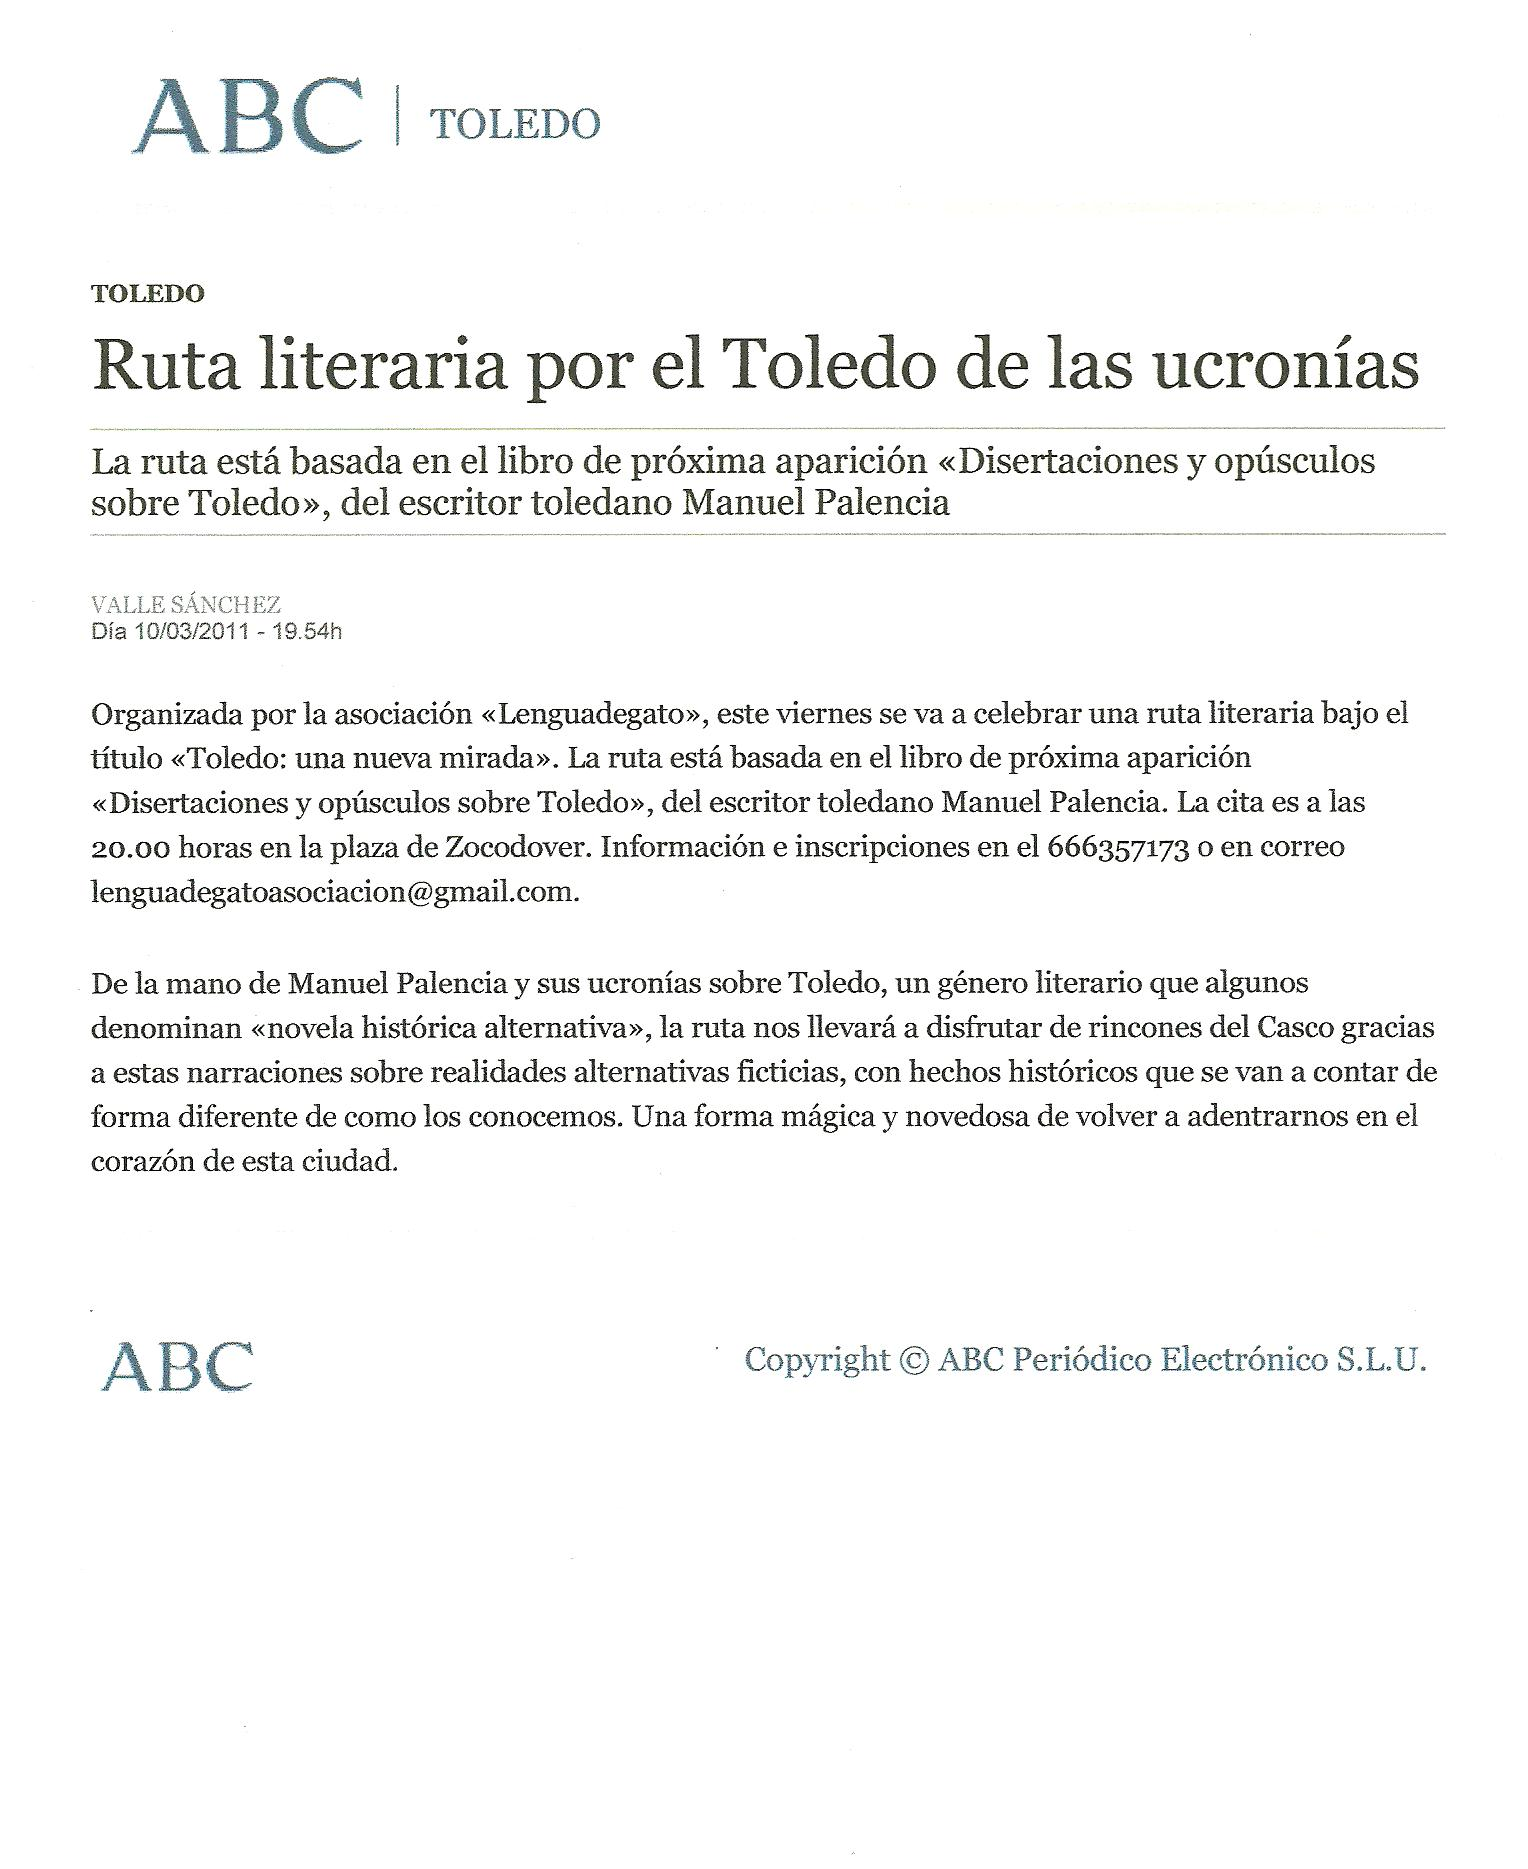 ABC-Toledo: Ruta literaria por Toledo, por Valle Sánchez.